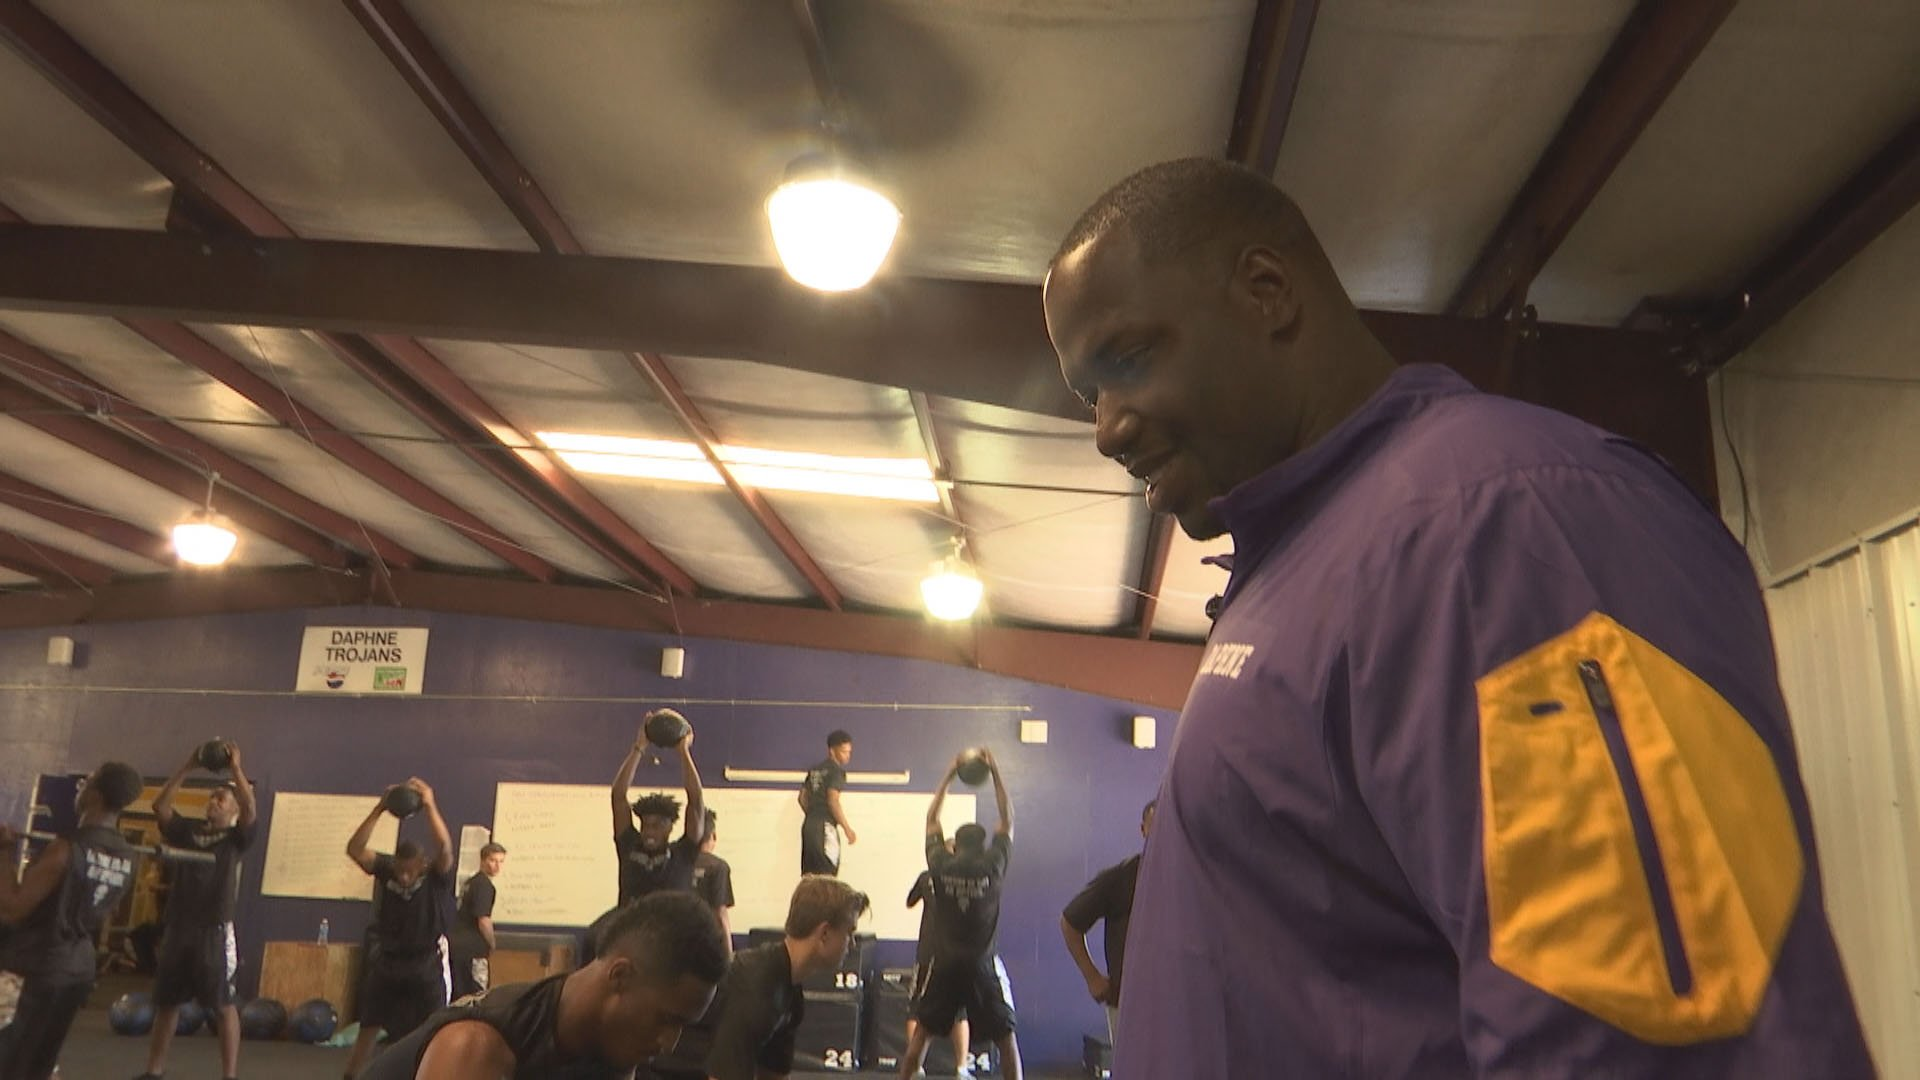 Kenny King coaching era begins, names DC candidate - CBS46 News